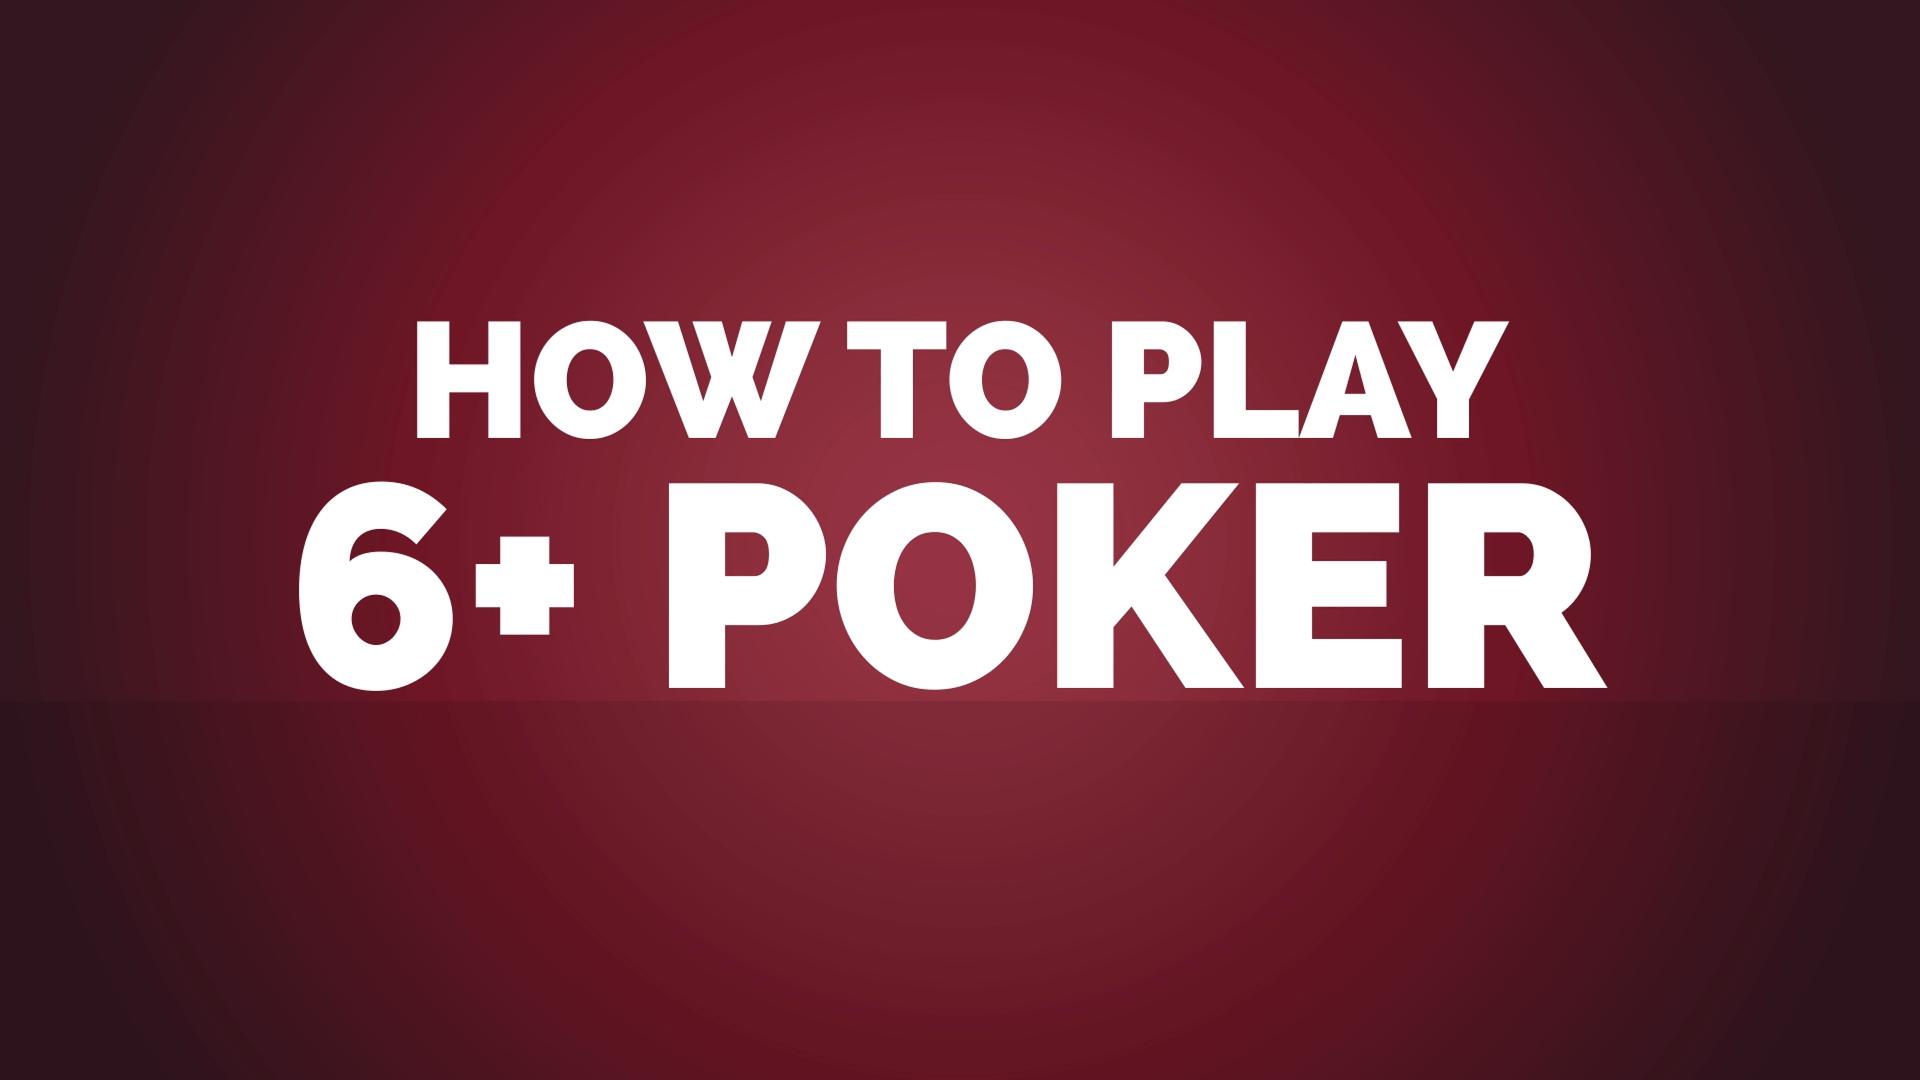 New Game 6+ Poker